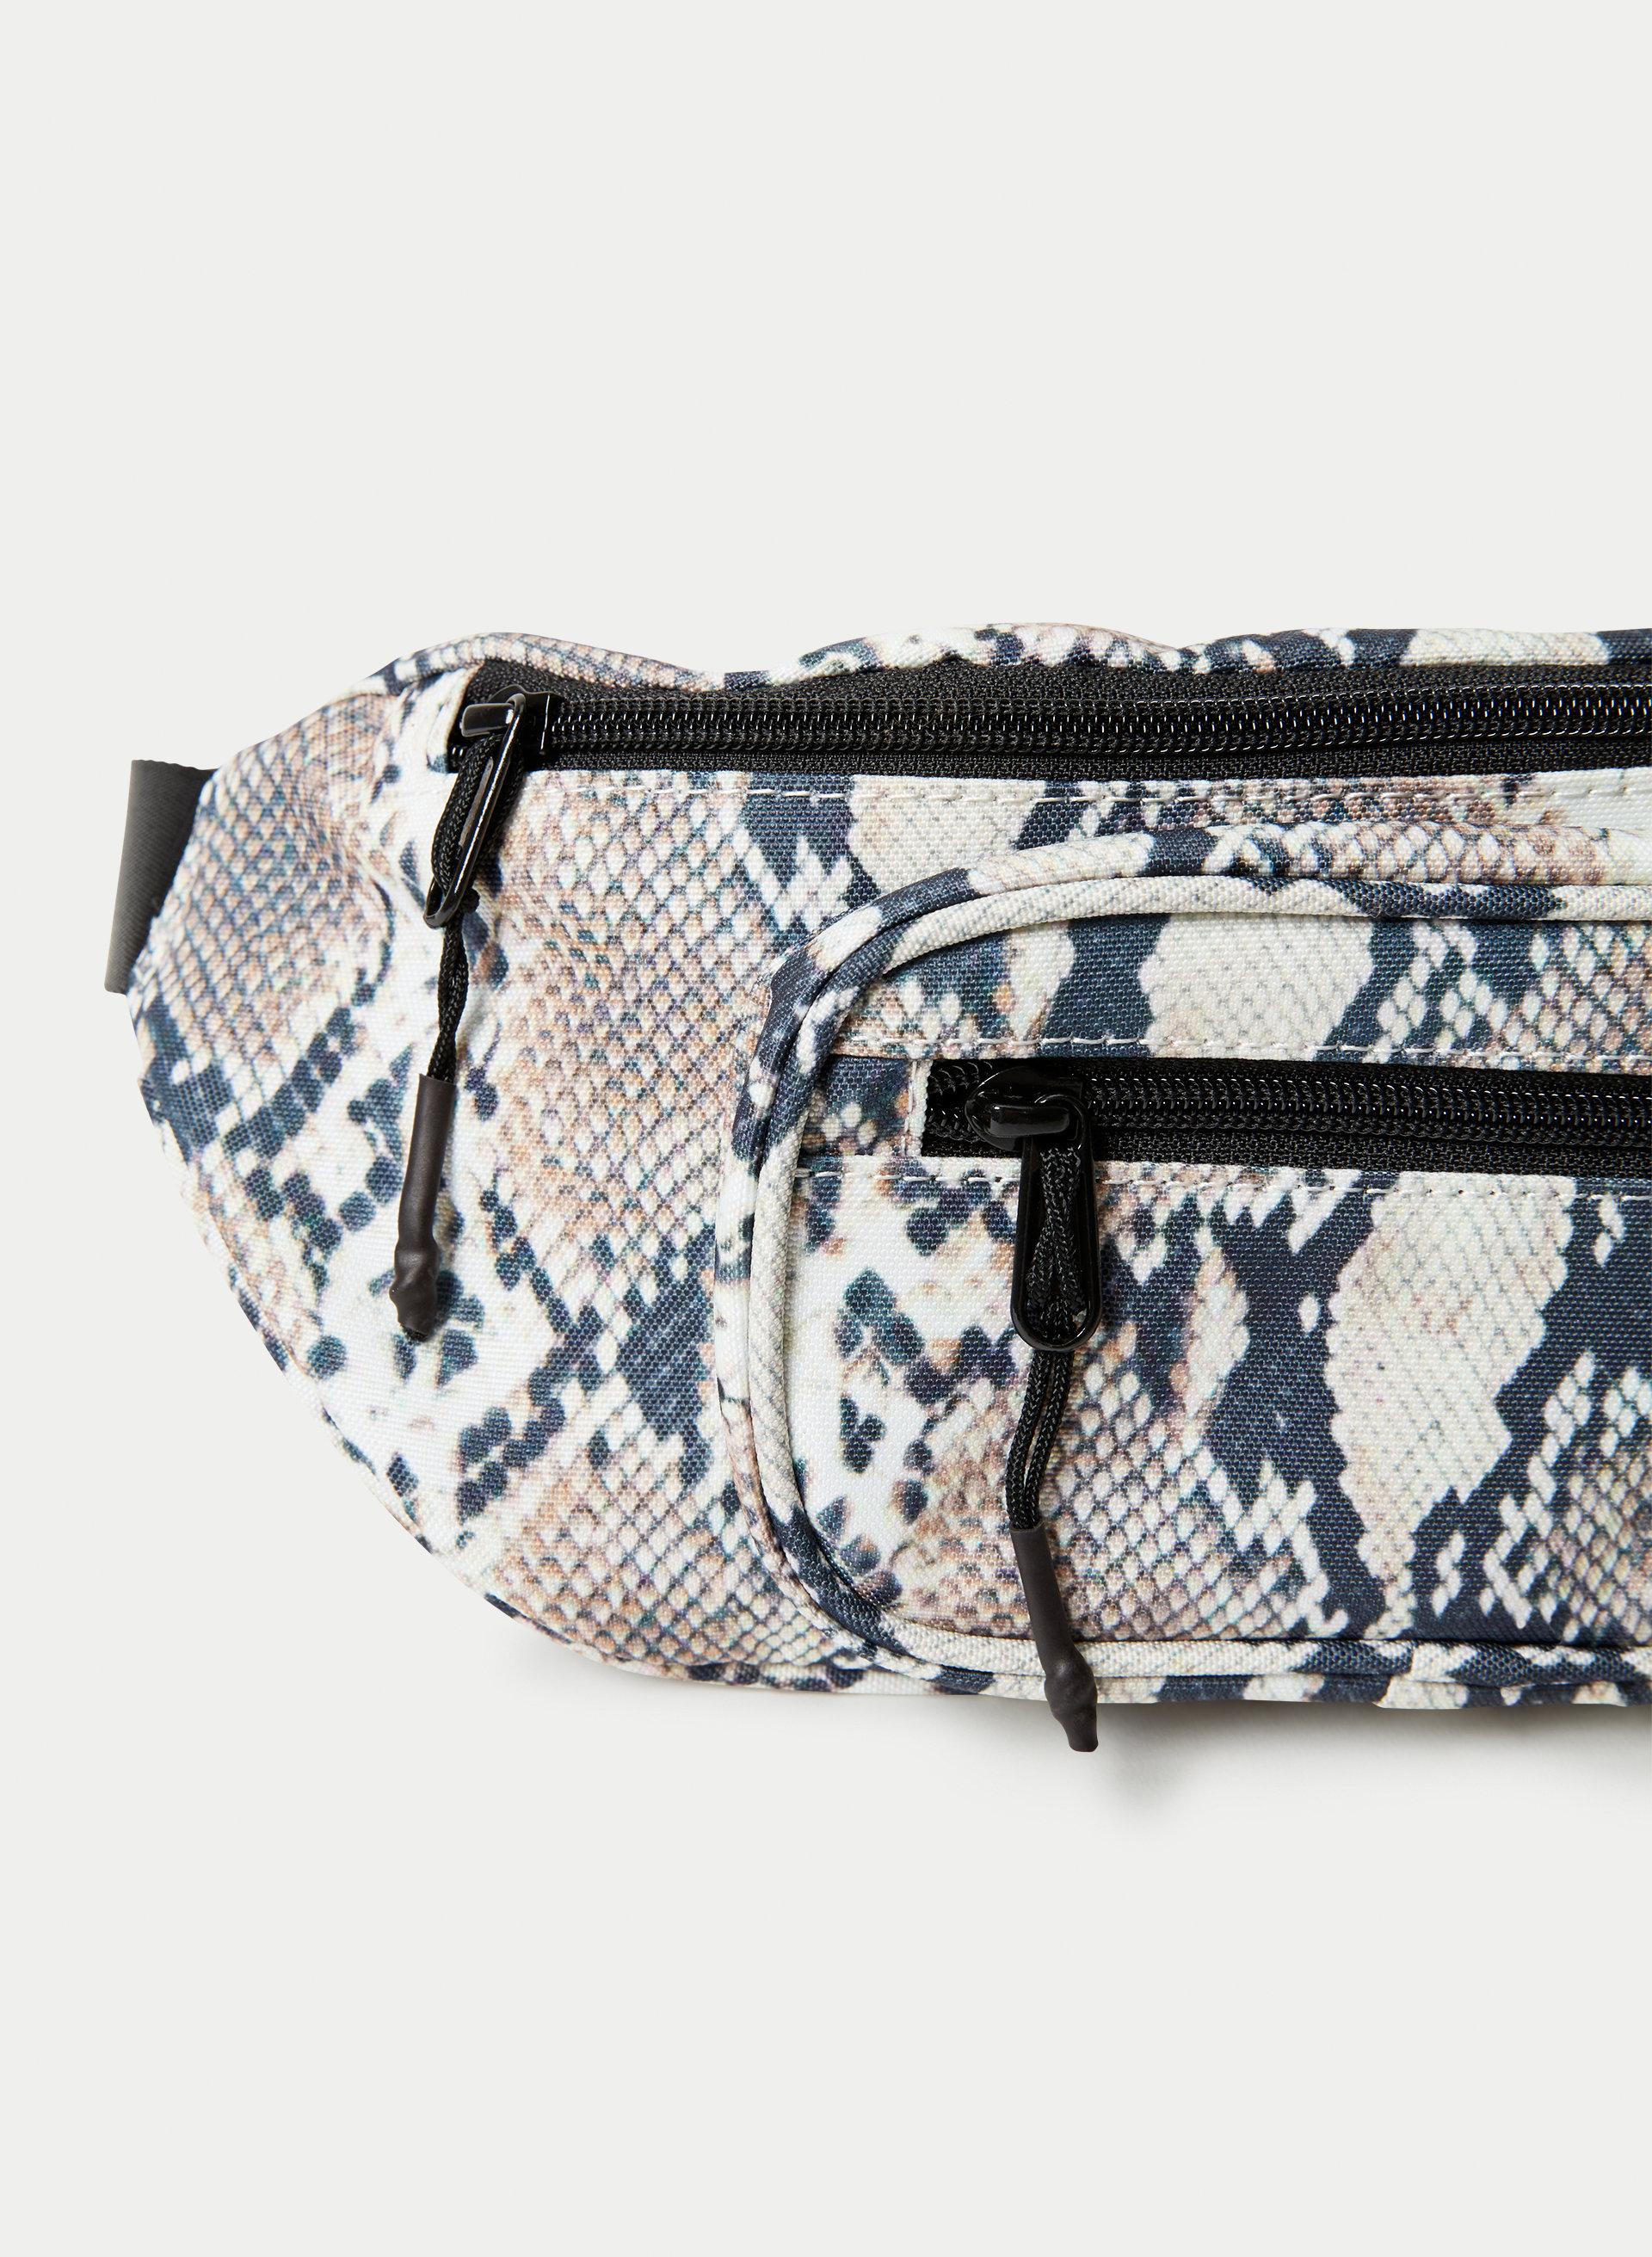 Hip Bag Miniature Bull Terrier Belly Bag Delicious Jeans Upcyling Belt Bag